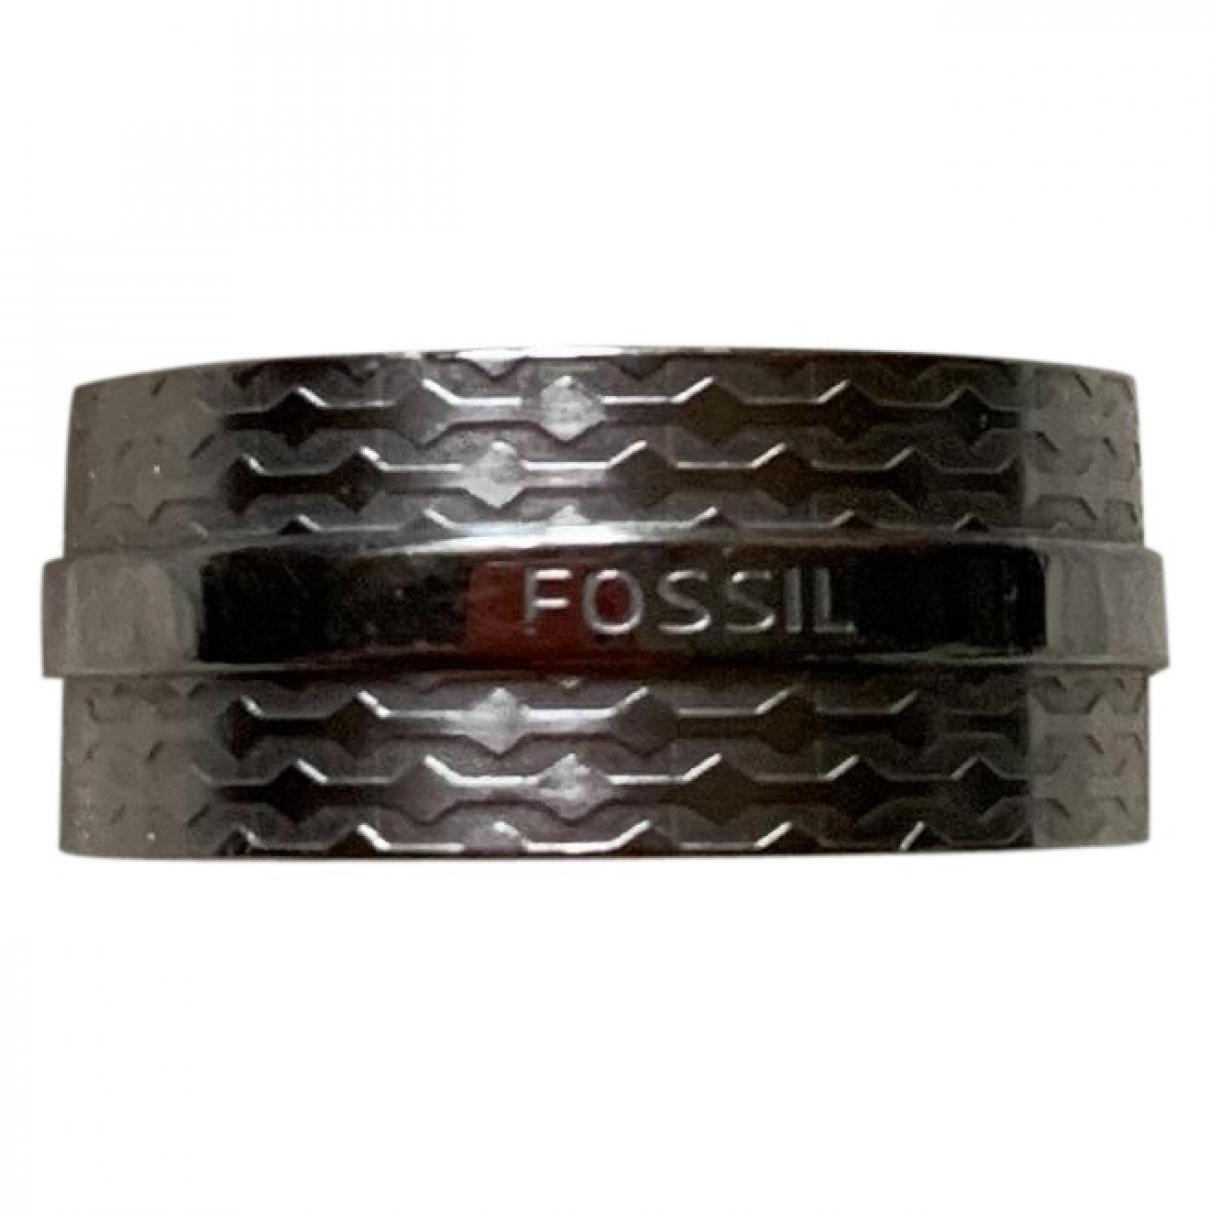 Fossil \N Schmuckstuecke in  Silber Stahl